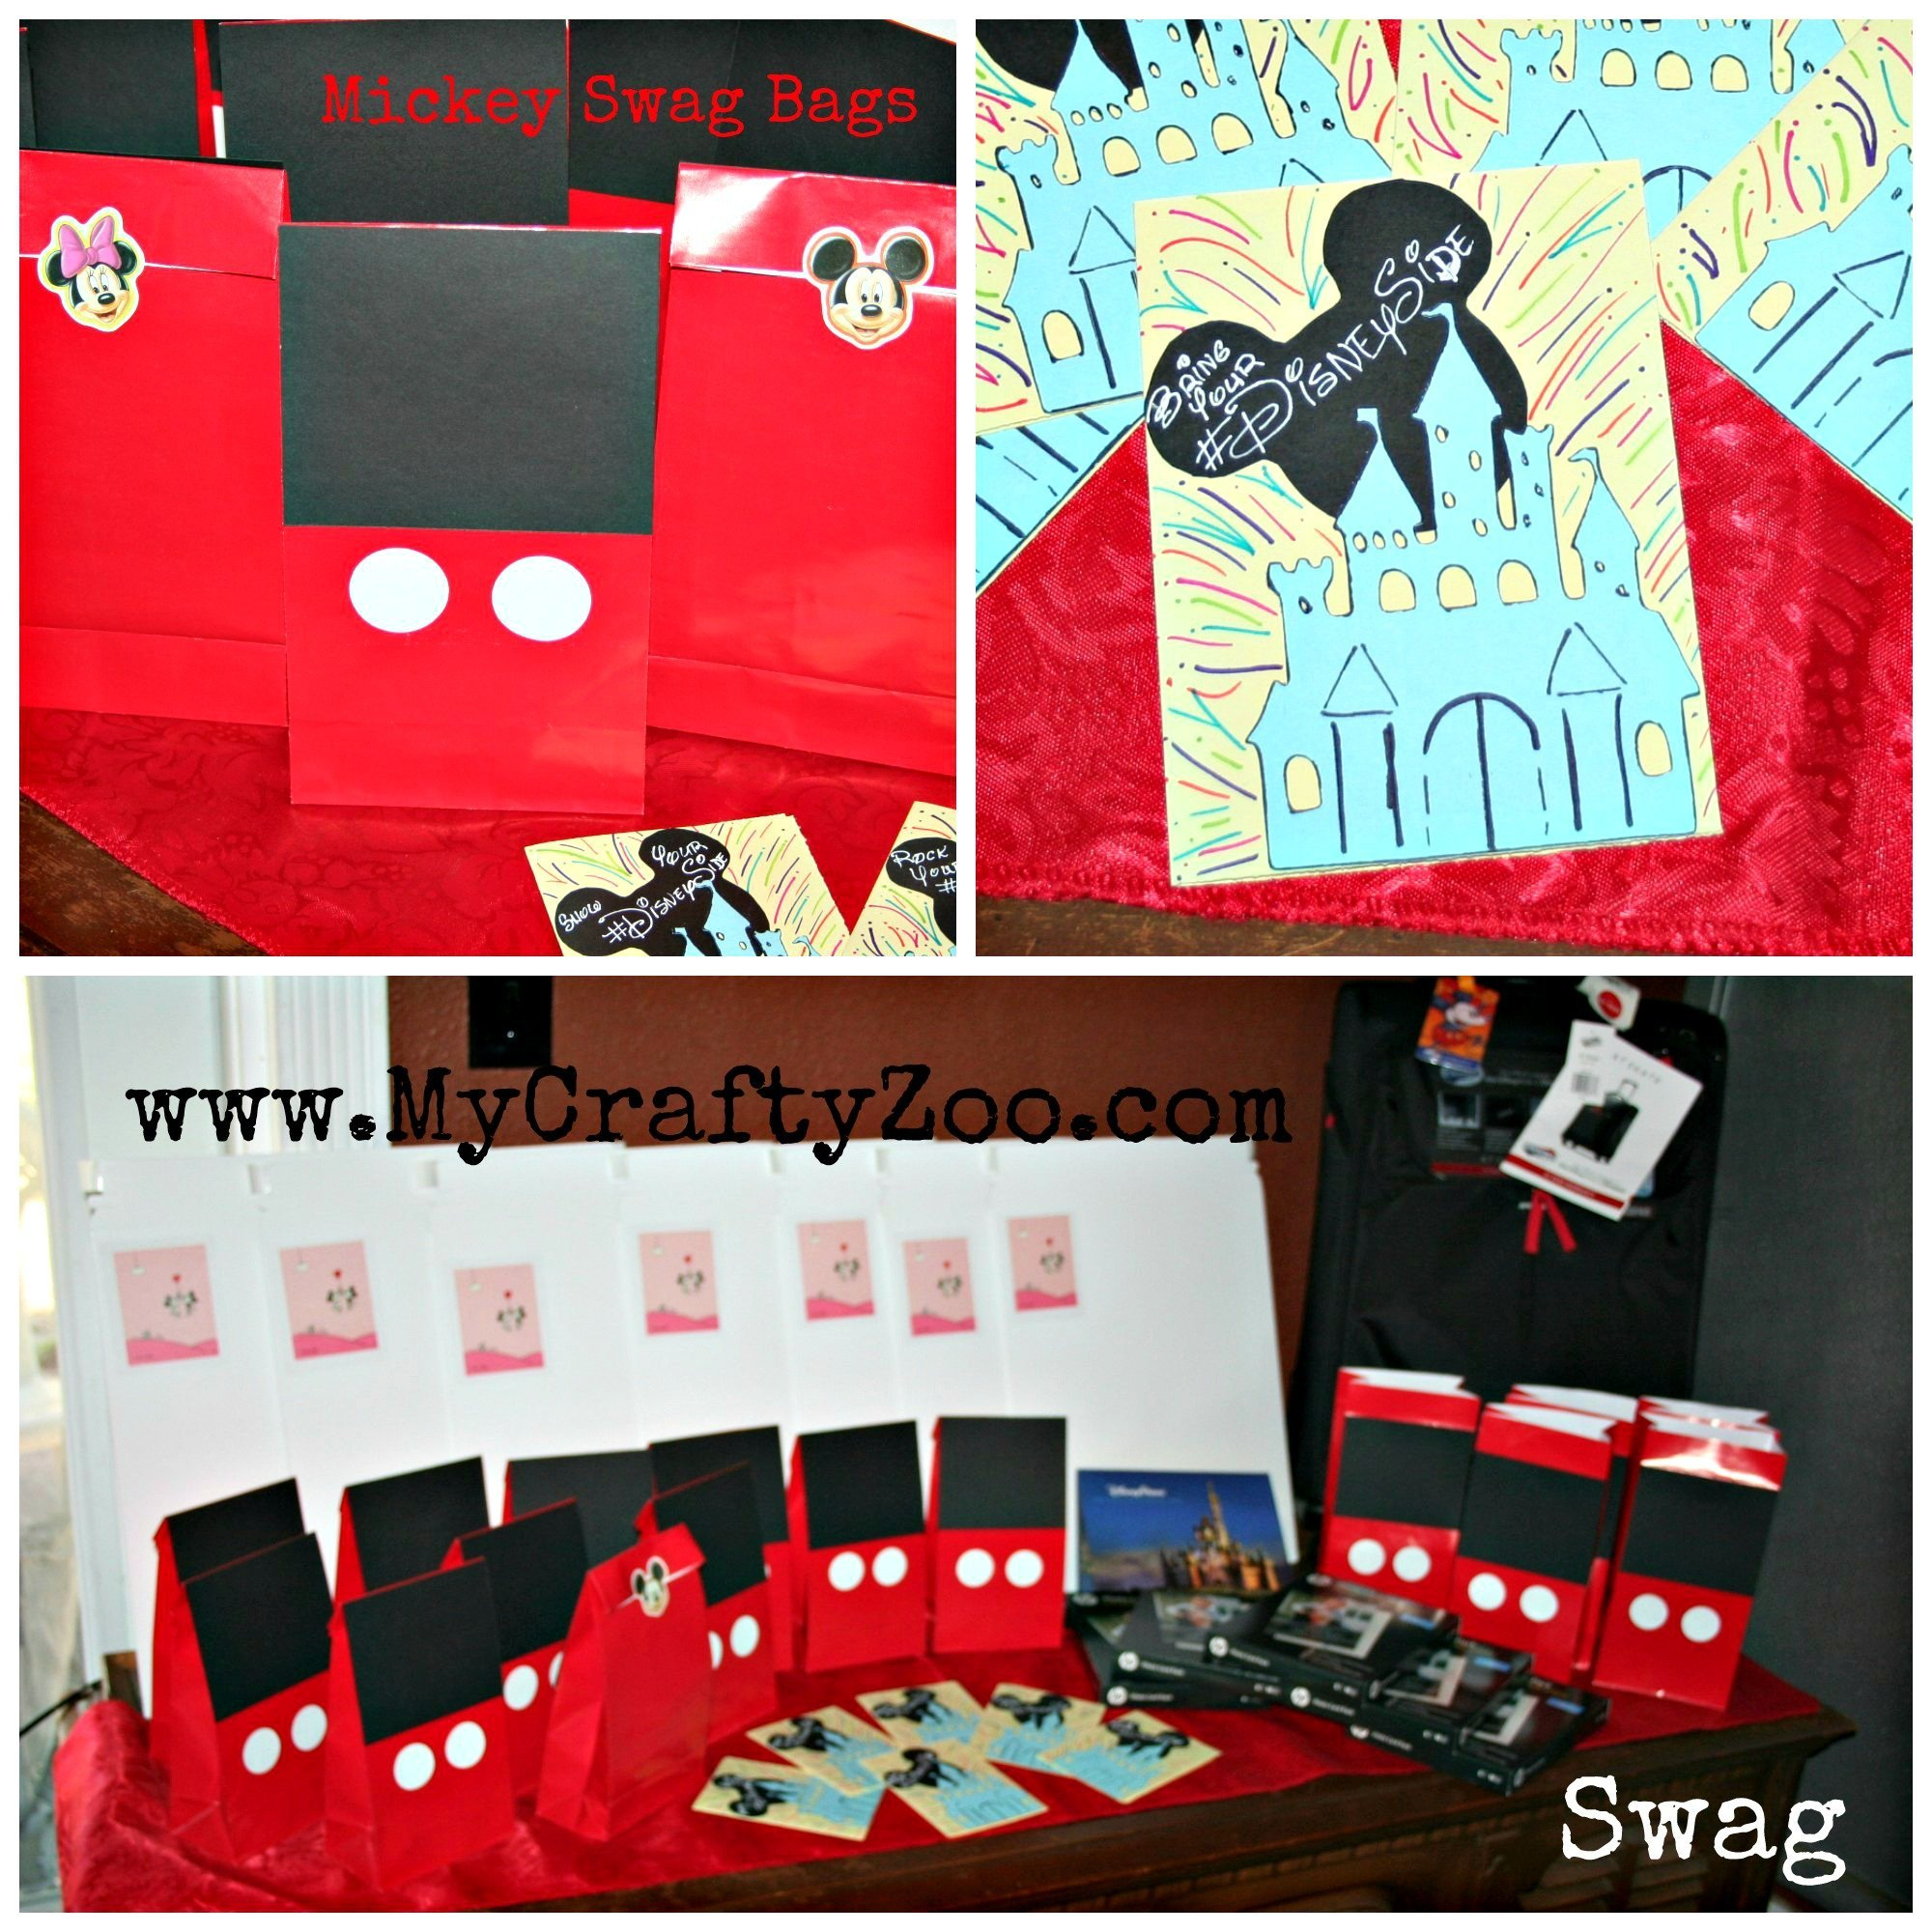 DisneySwag #DisneySide @Home Celebration Party